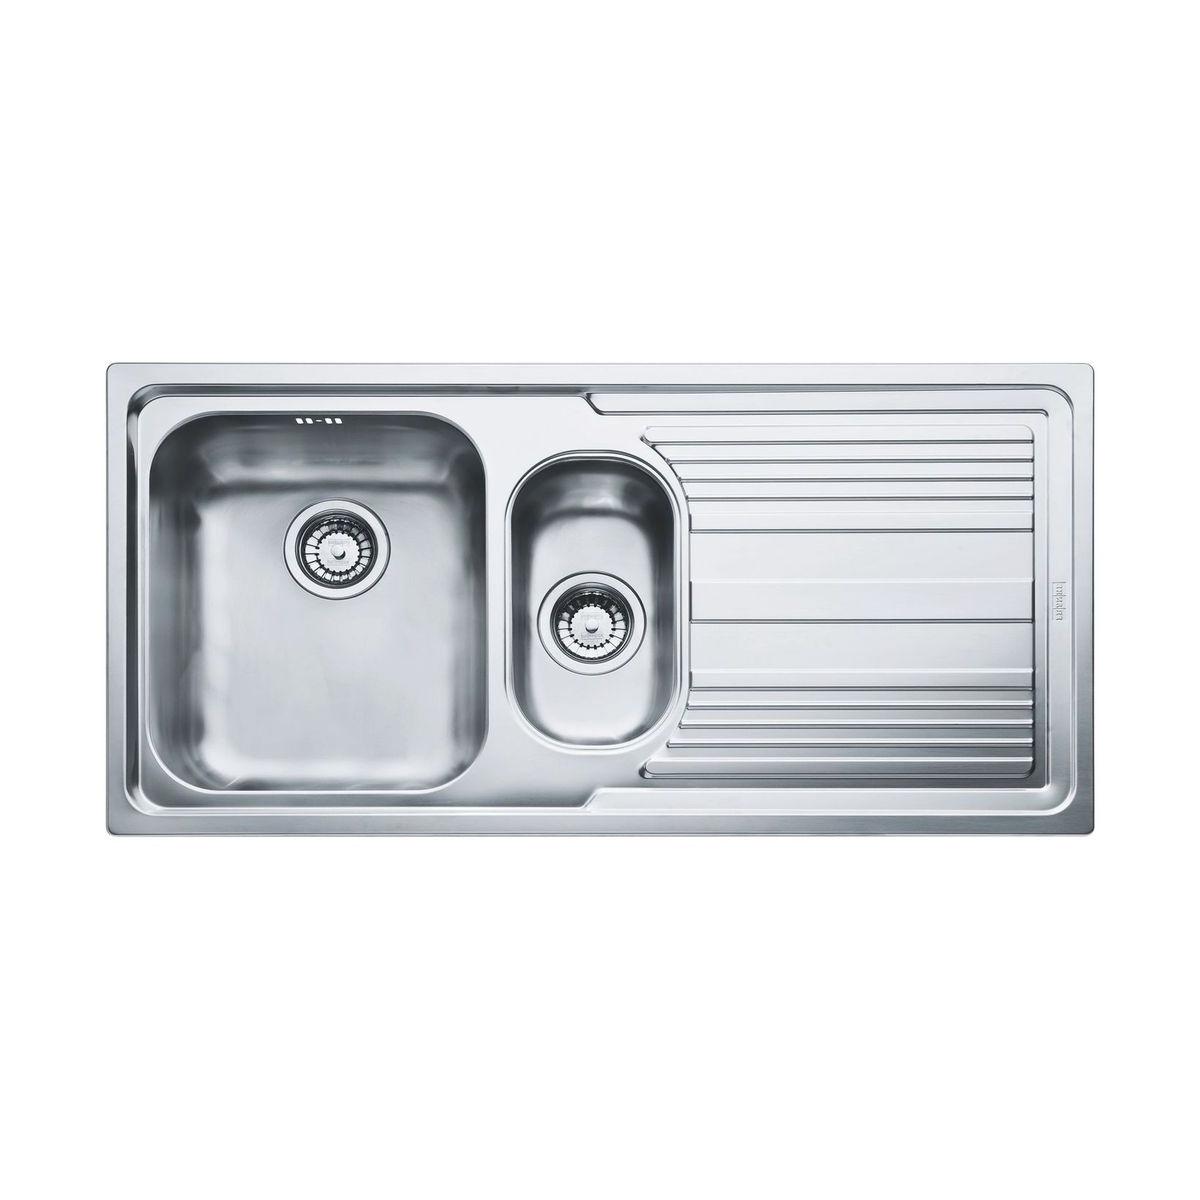 Кухонная мойка Franke Logica Line LLX 651 чаша слева полированная franke anx 211 86 нерж сталь чаша слева